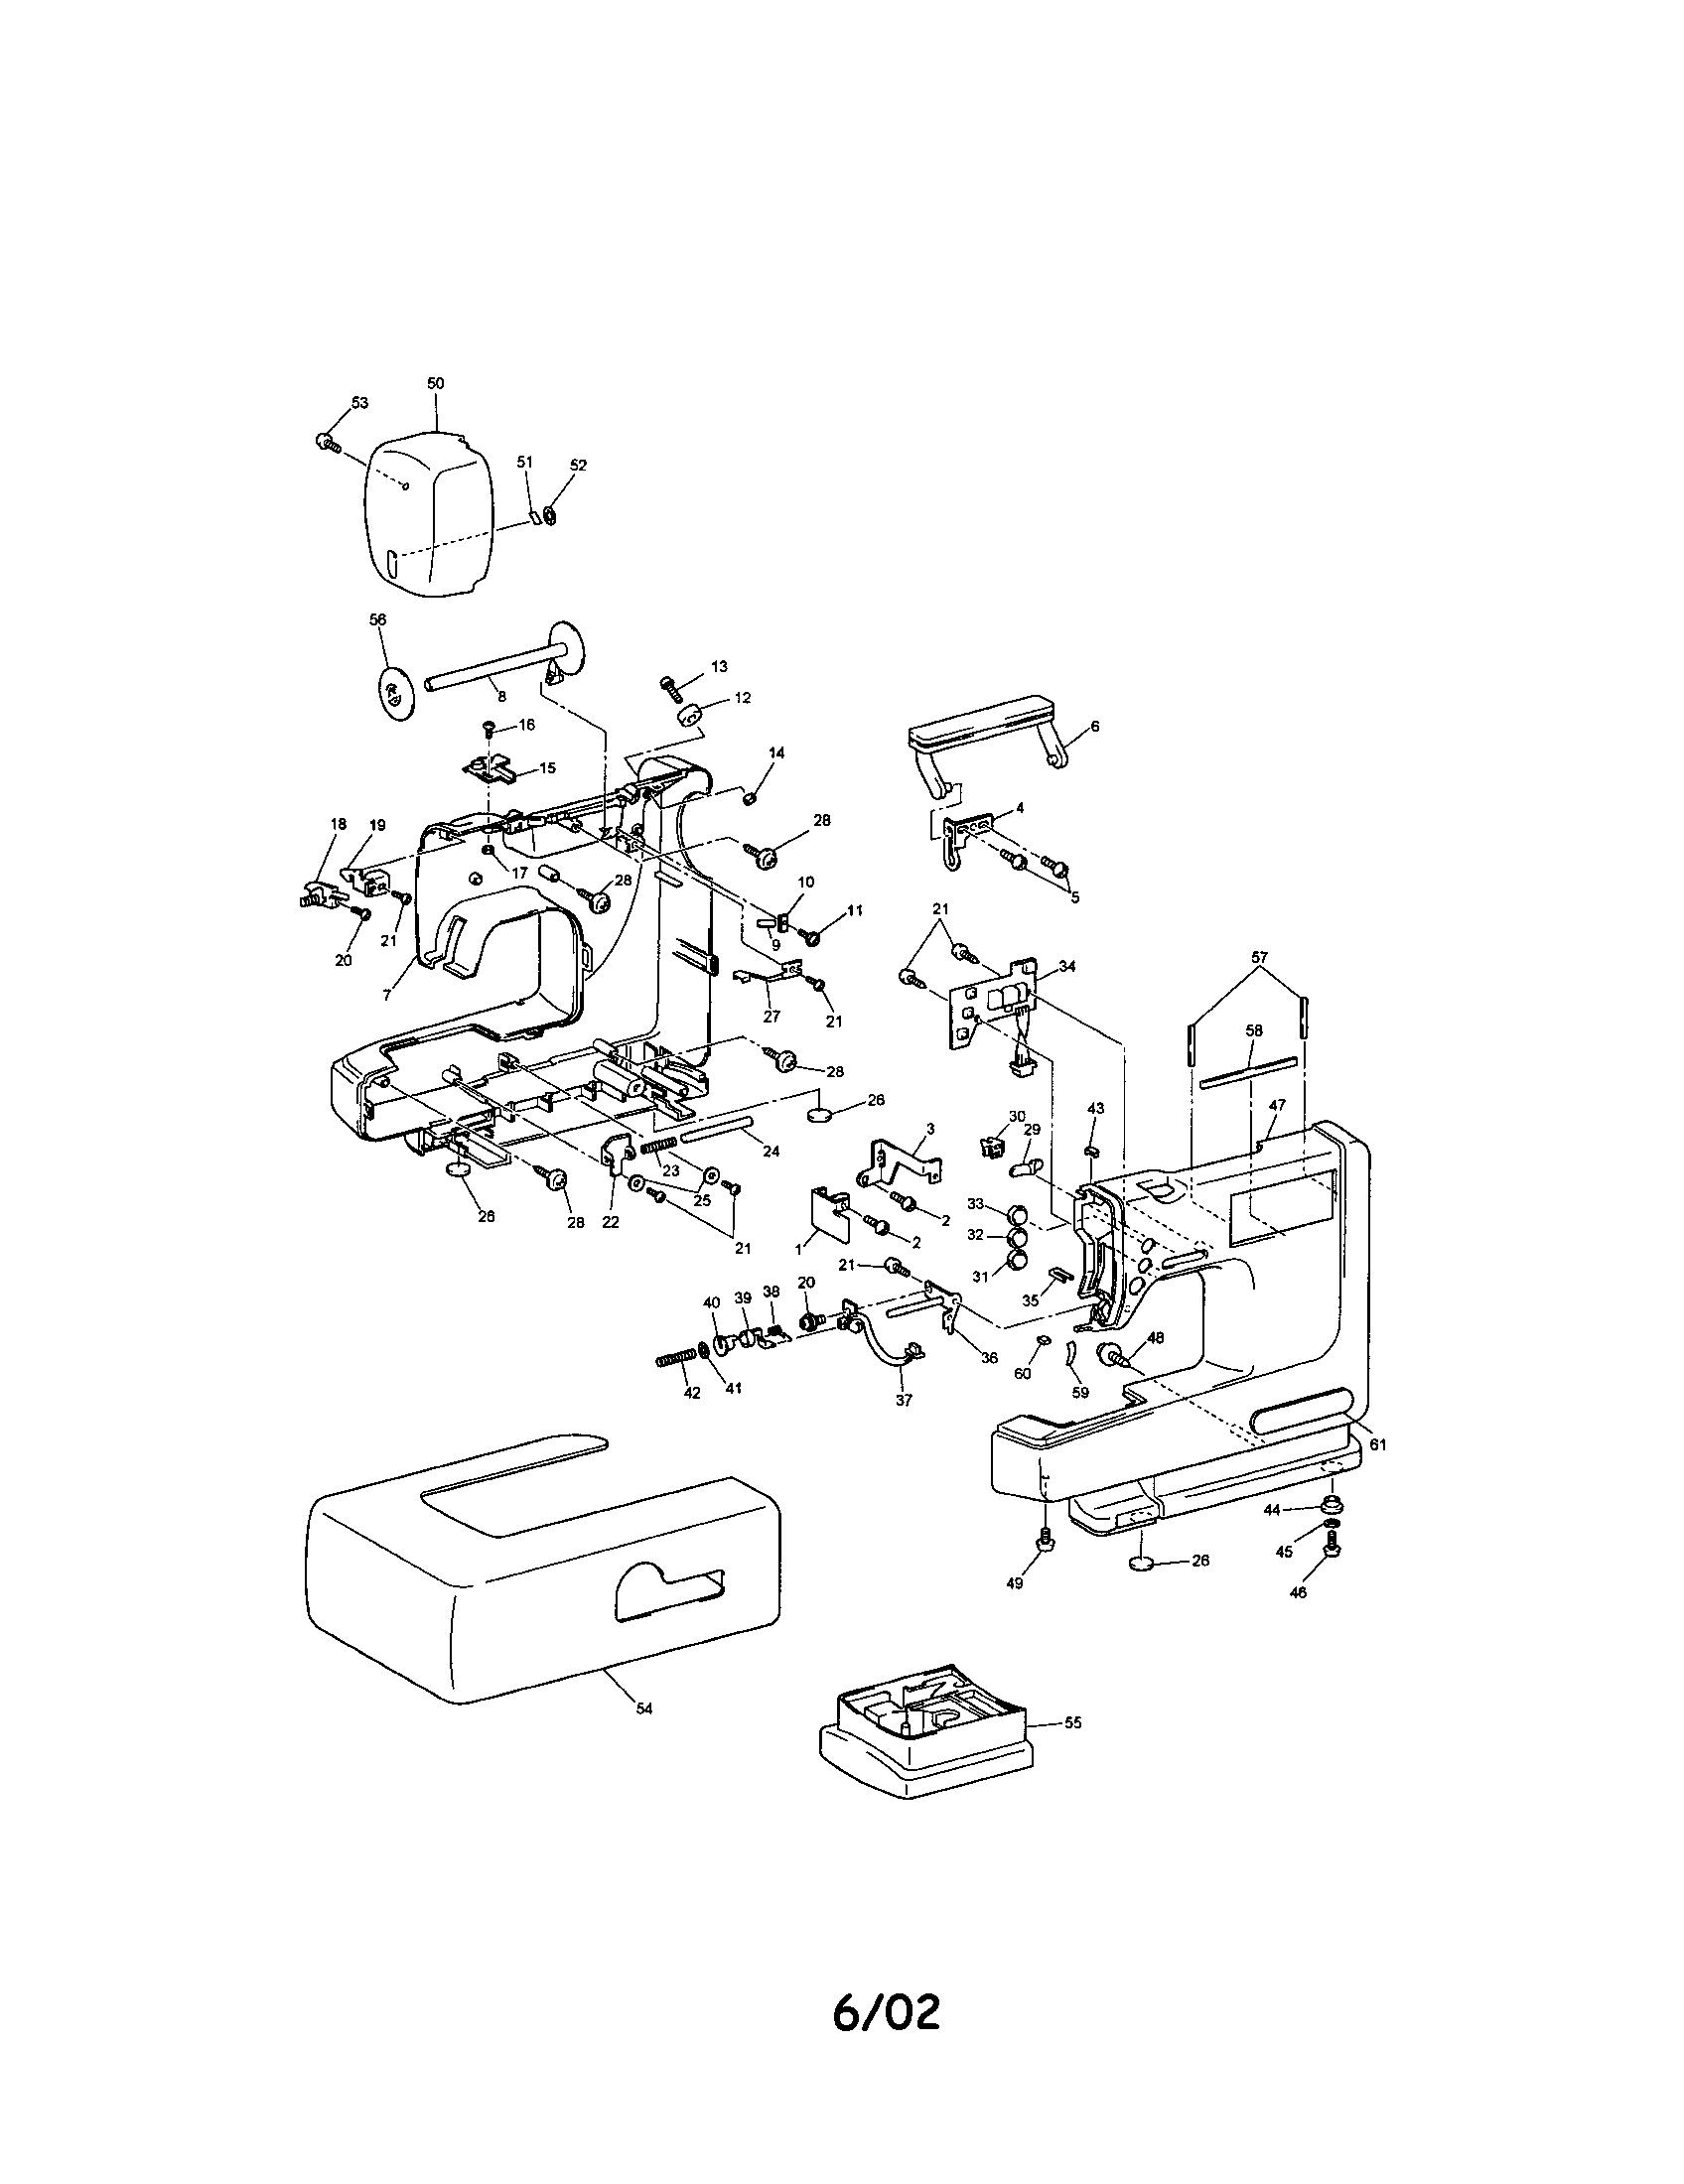 Poulan Weedeater Carburetor Diagram Poulan 446T Pro Fuel